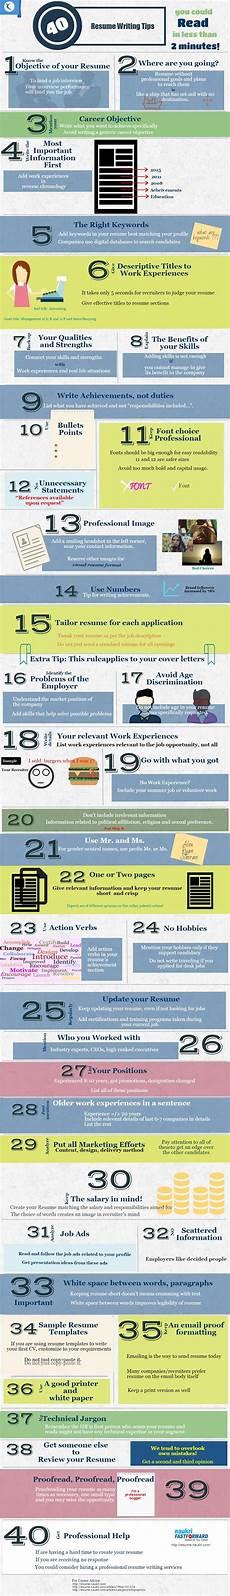 Naukri Resume Writing 40 Resume Writing Tips You Can Read In 2 Minutes Naukri Com